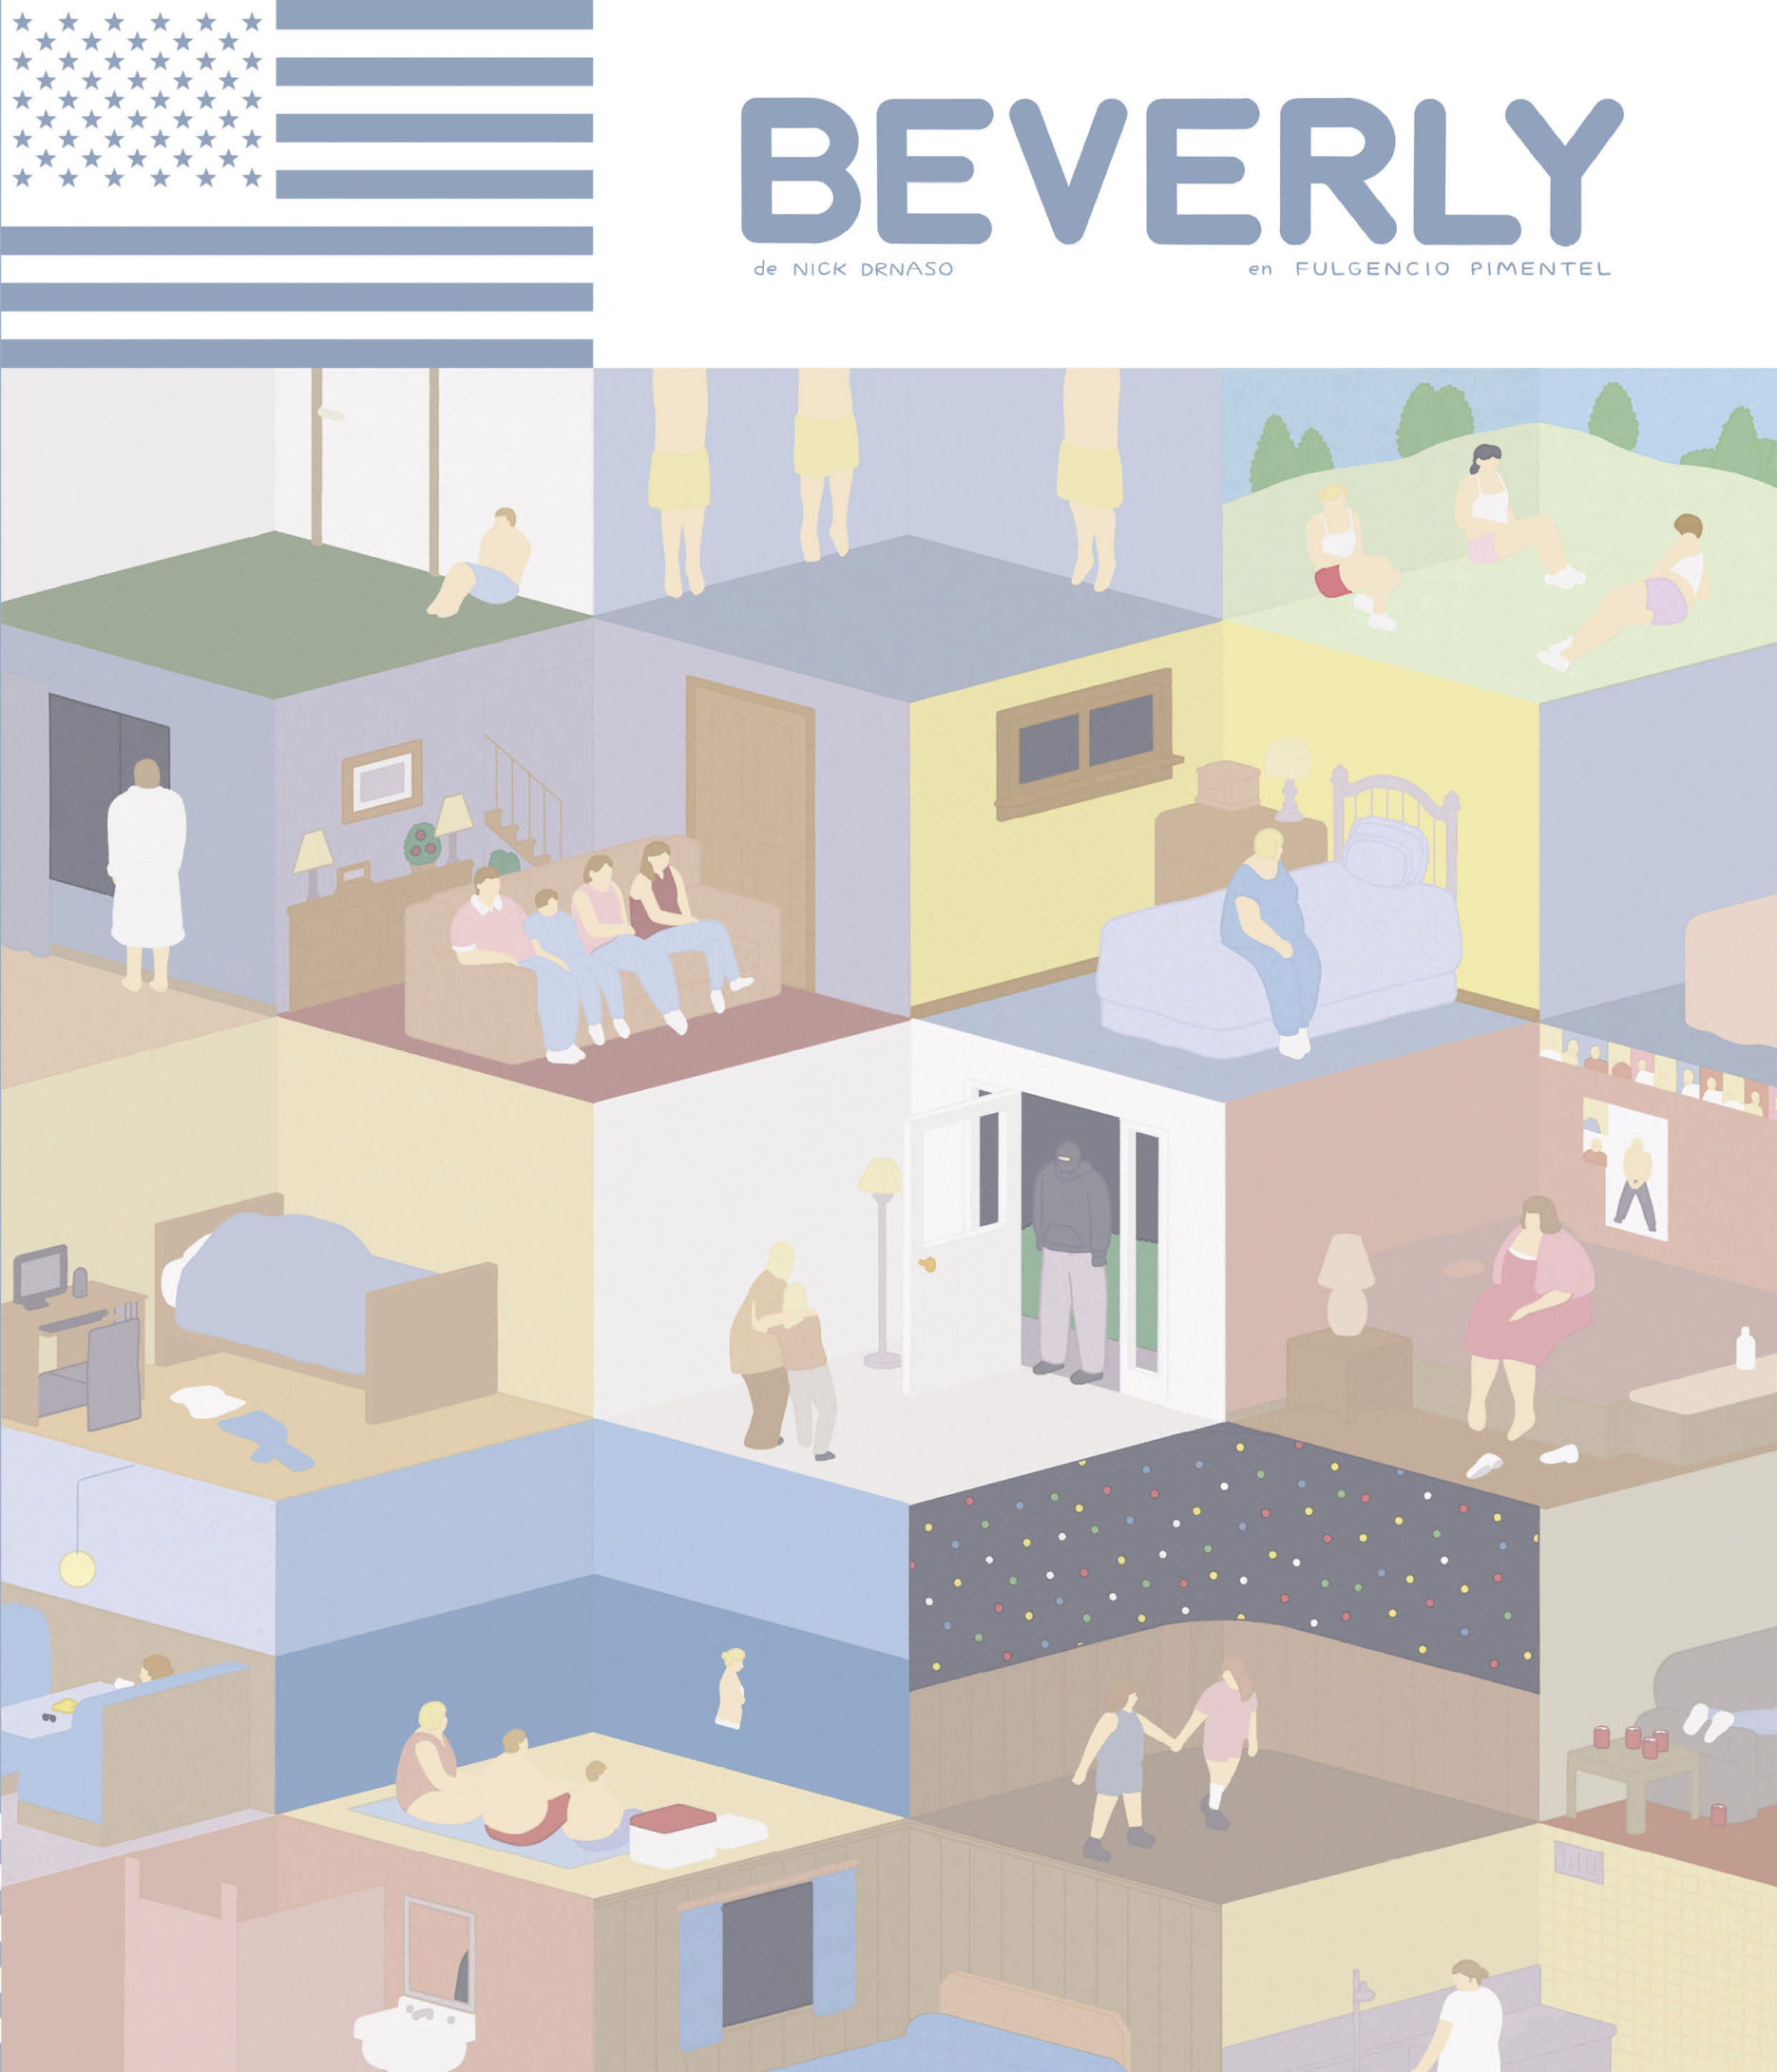 BEVERLY.cubierta FP